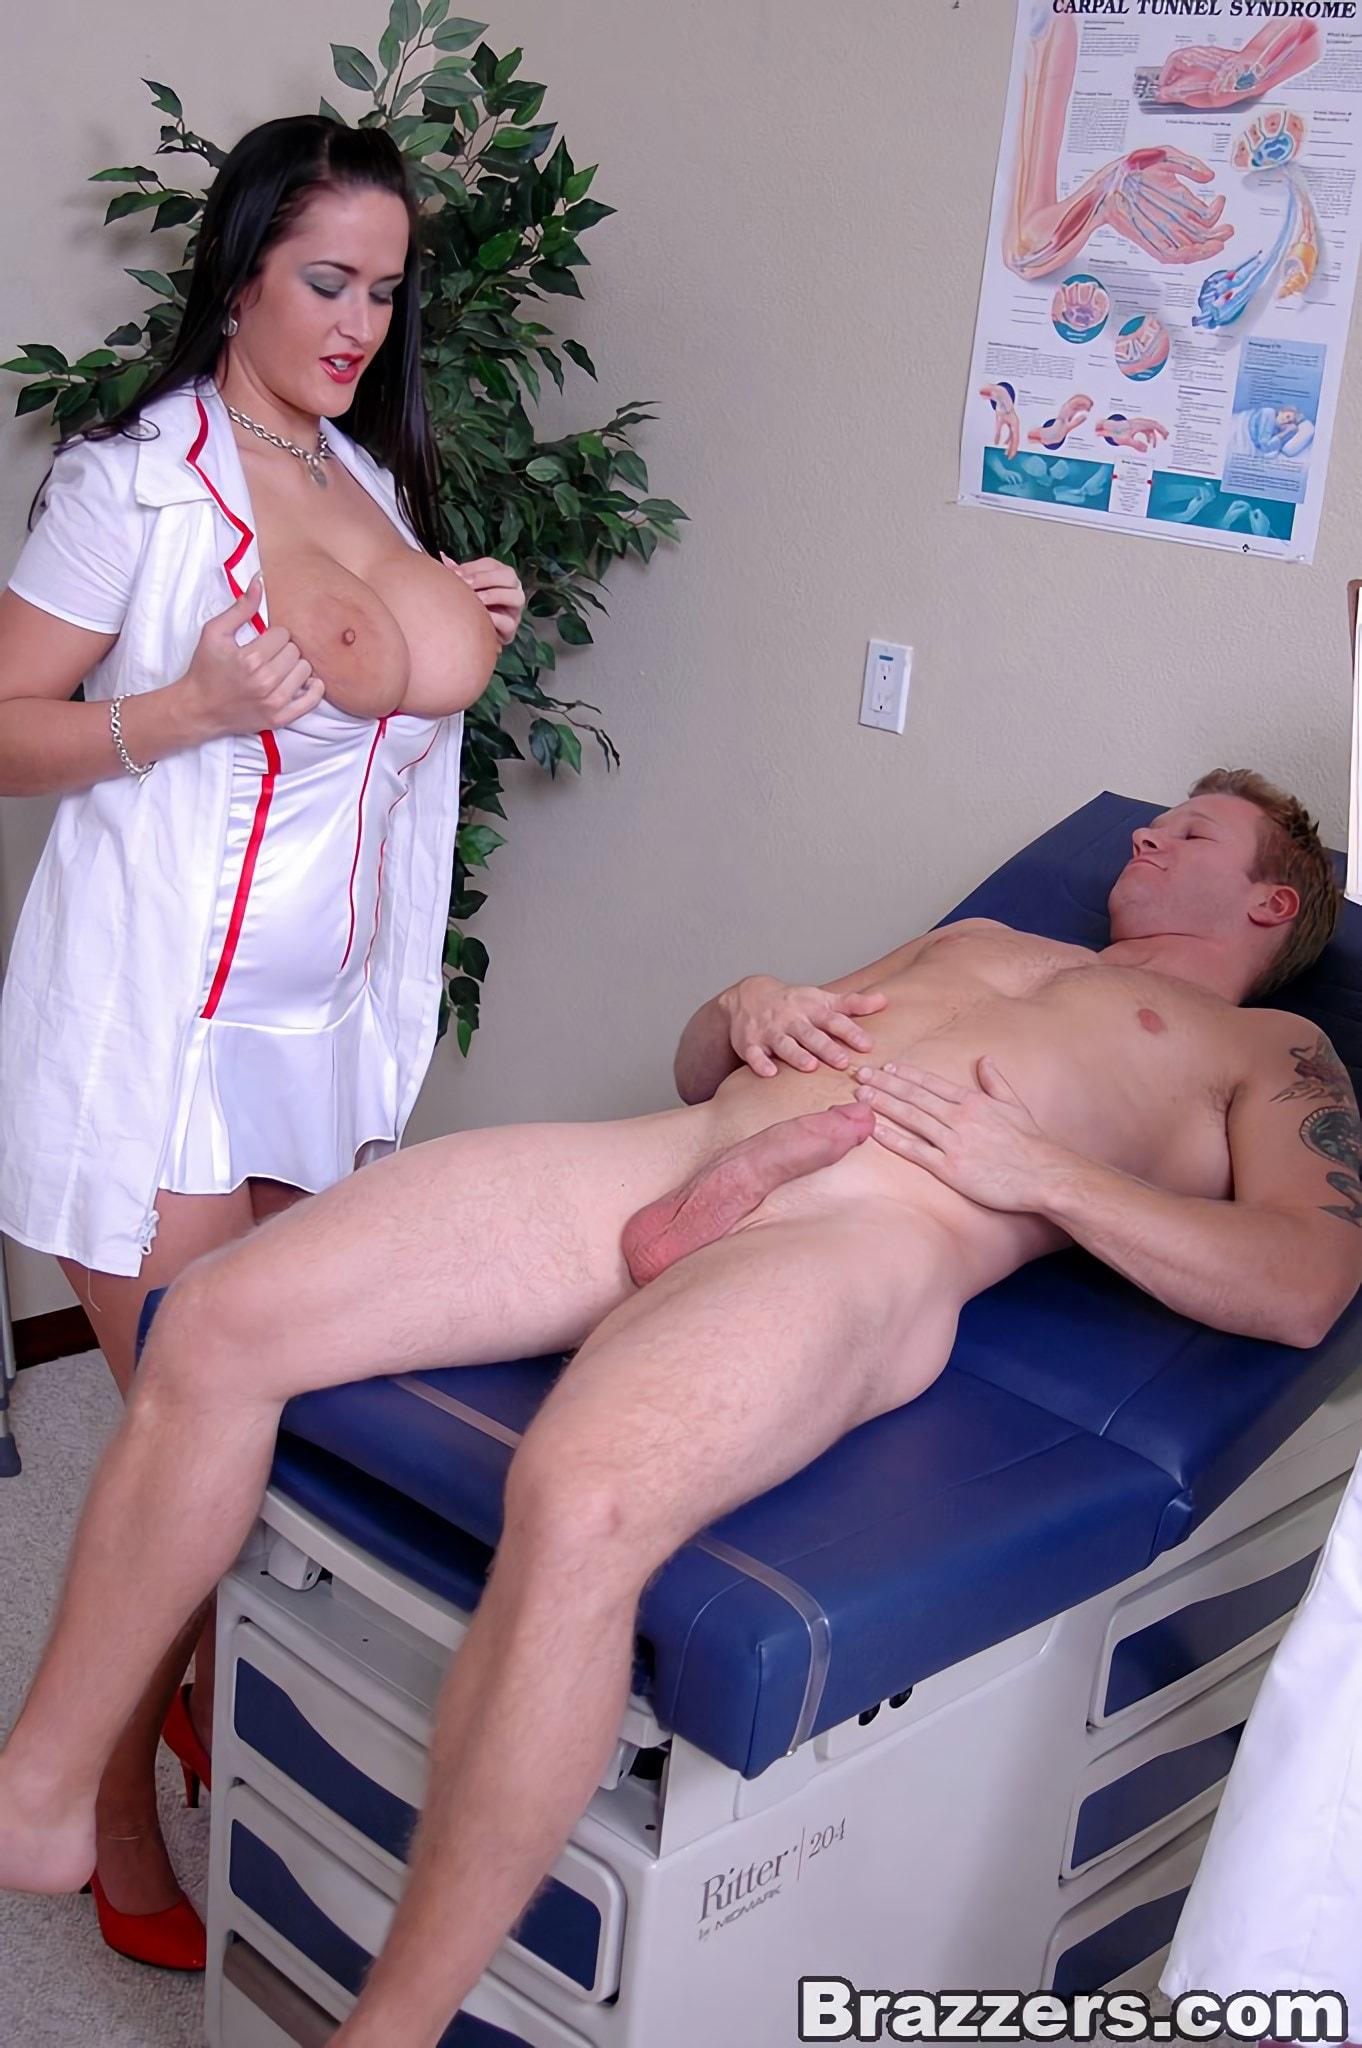 Зрелые медсестрички соблазнили пациентов порно фото бесплатно